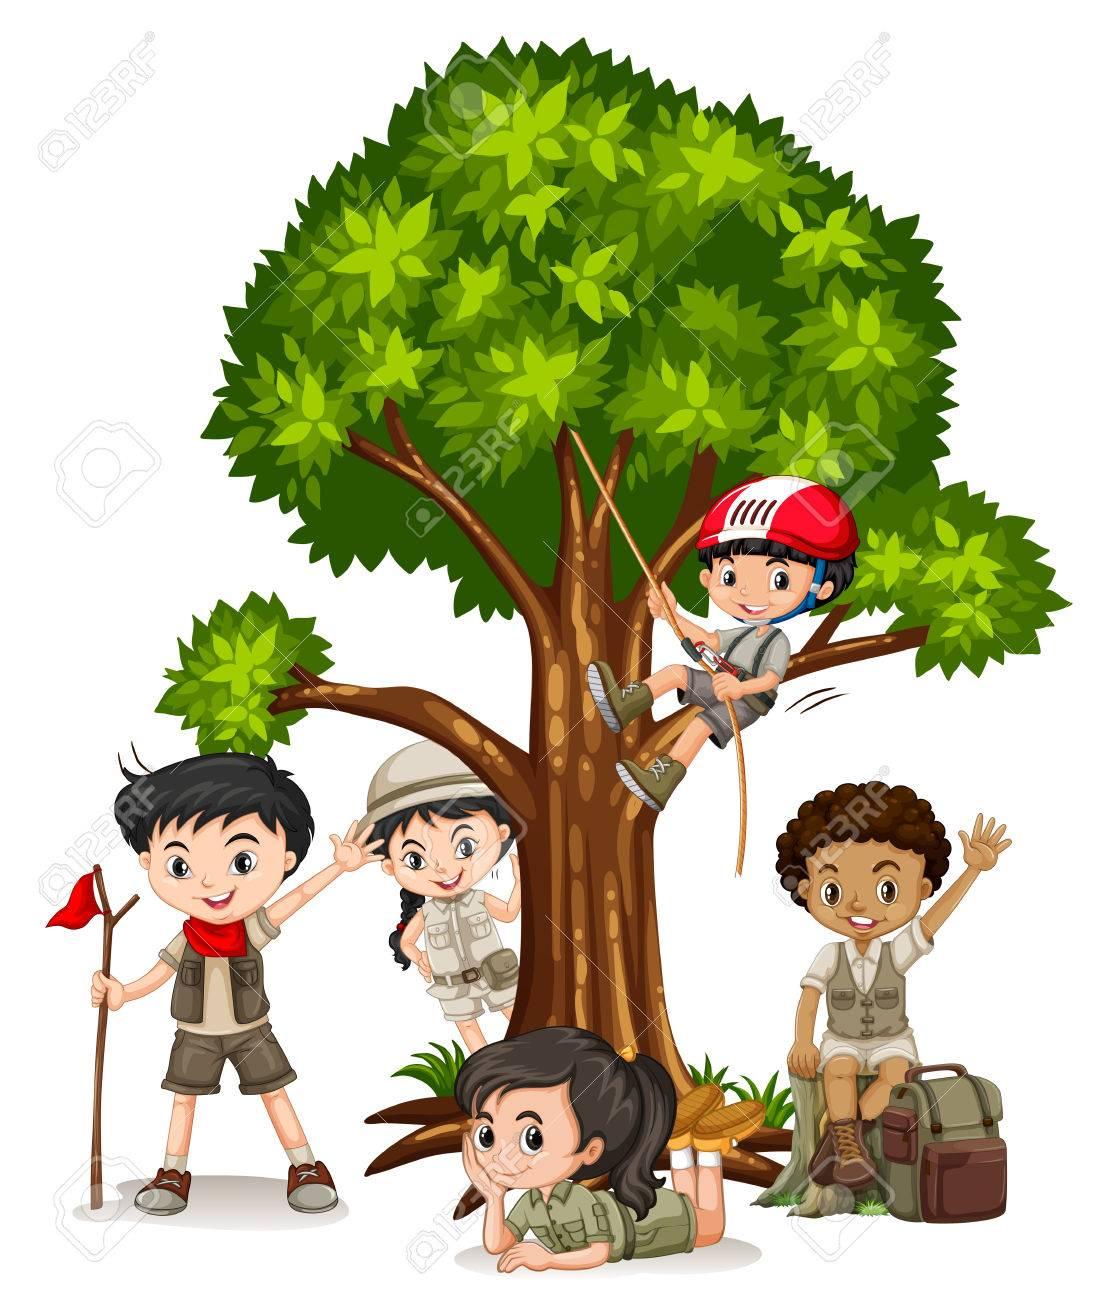 Boys and girls climbing tree illustration.